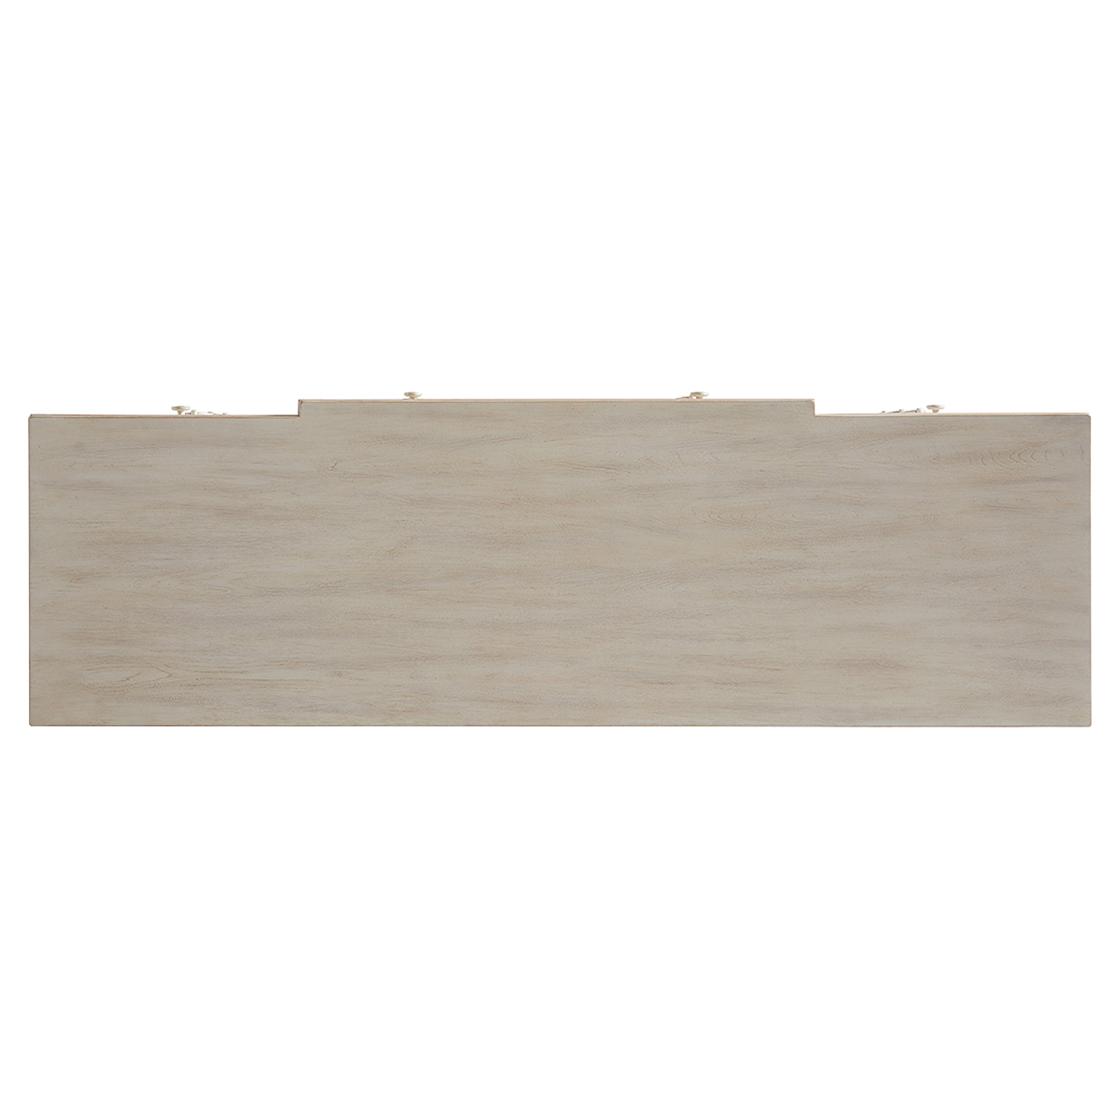 Barclay Butera Garnet Modern 12-Self Closing Drawers Whitewash Wood Dresser